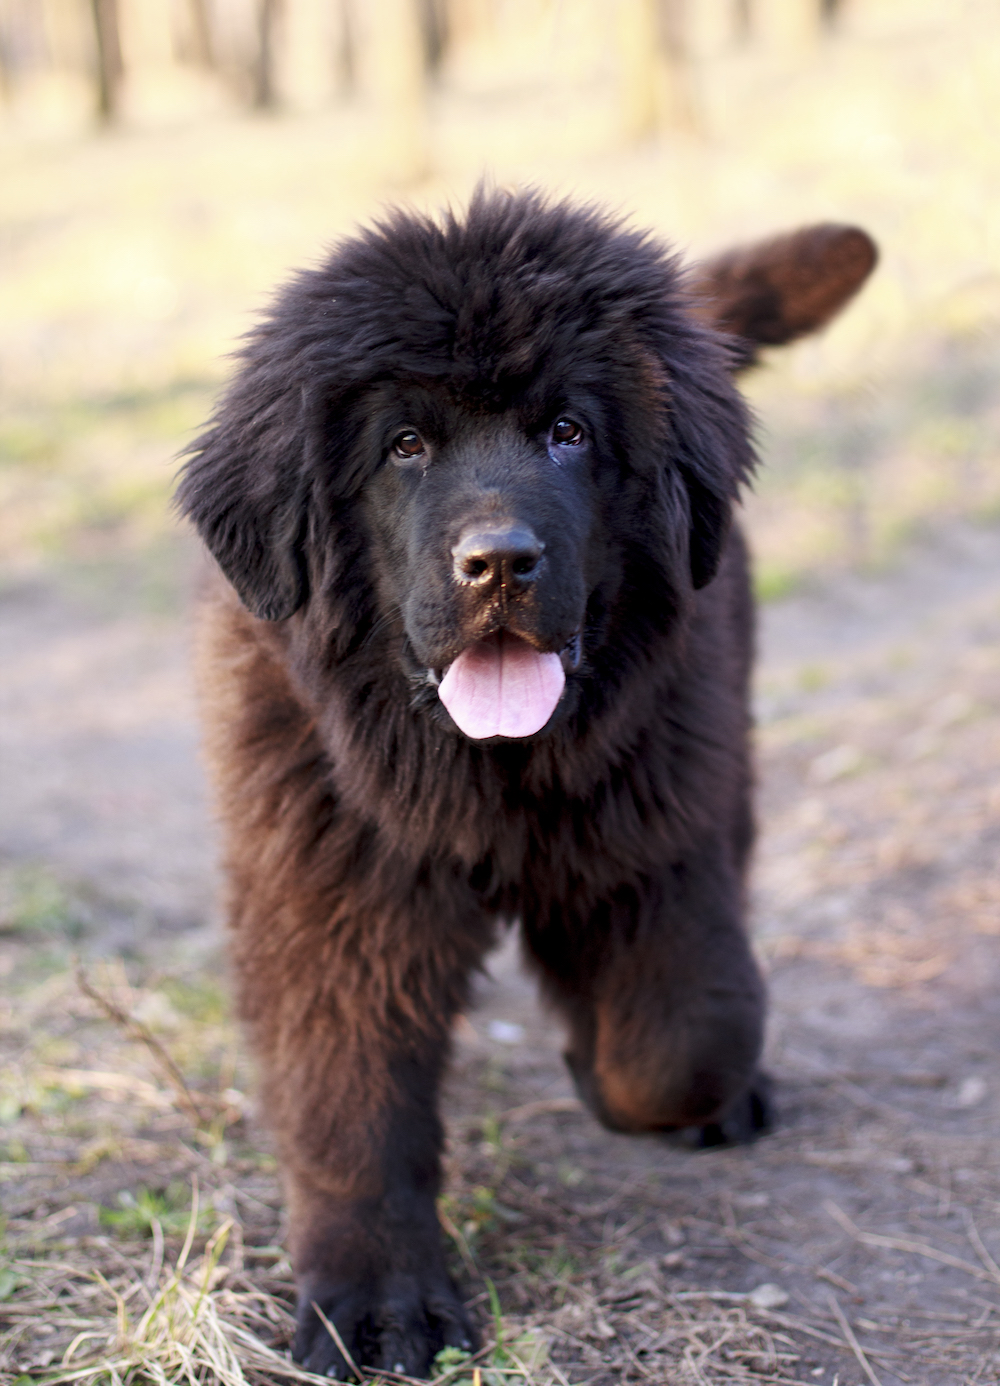 Newfoundland puppy in forest